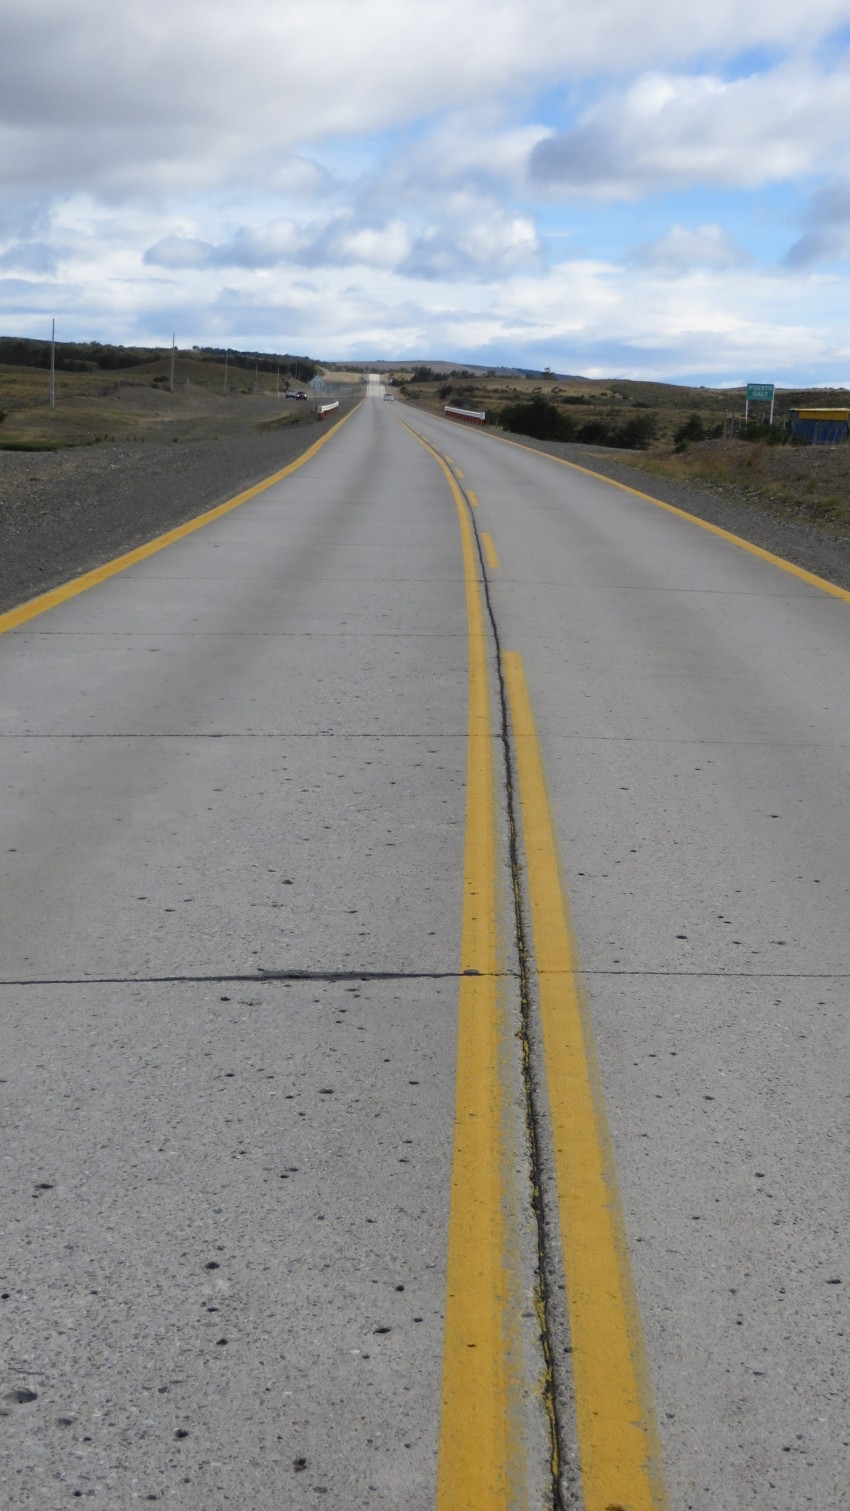 Patagonia straightaway